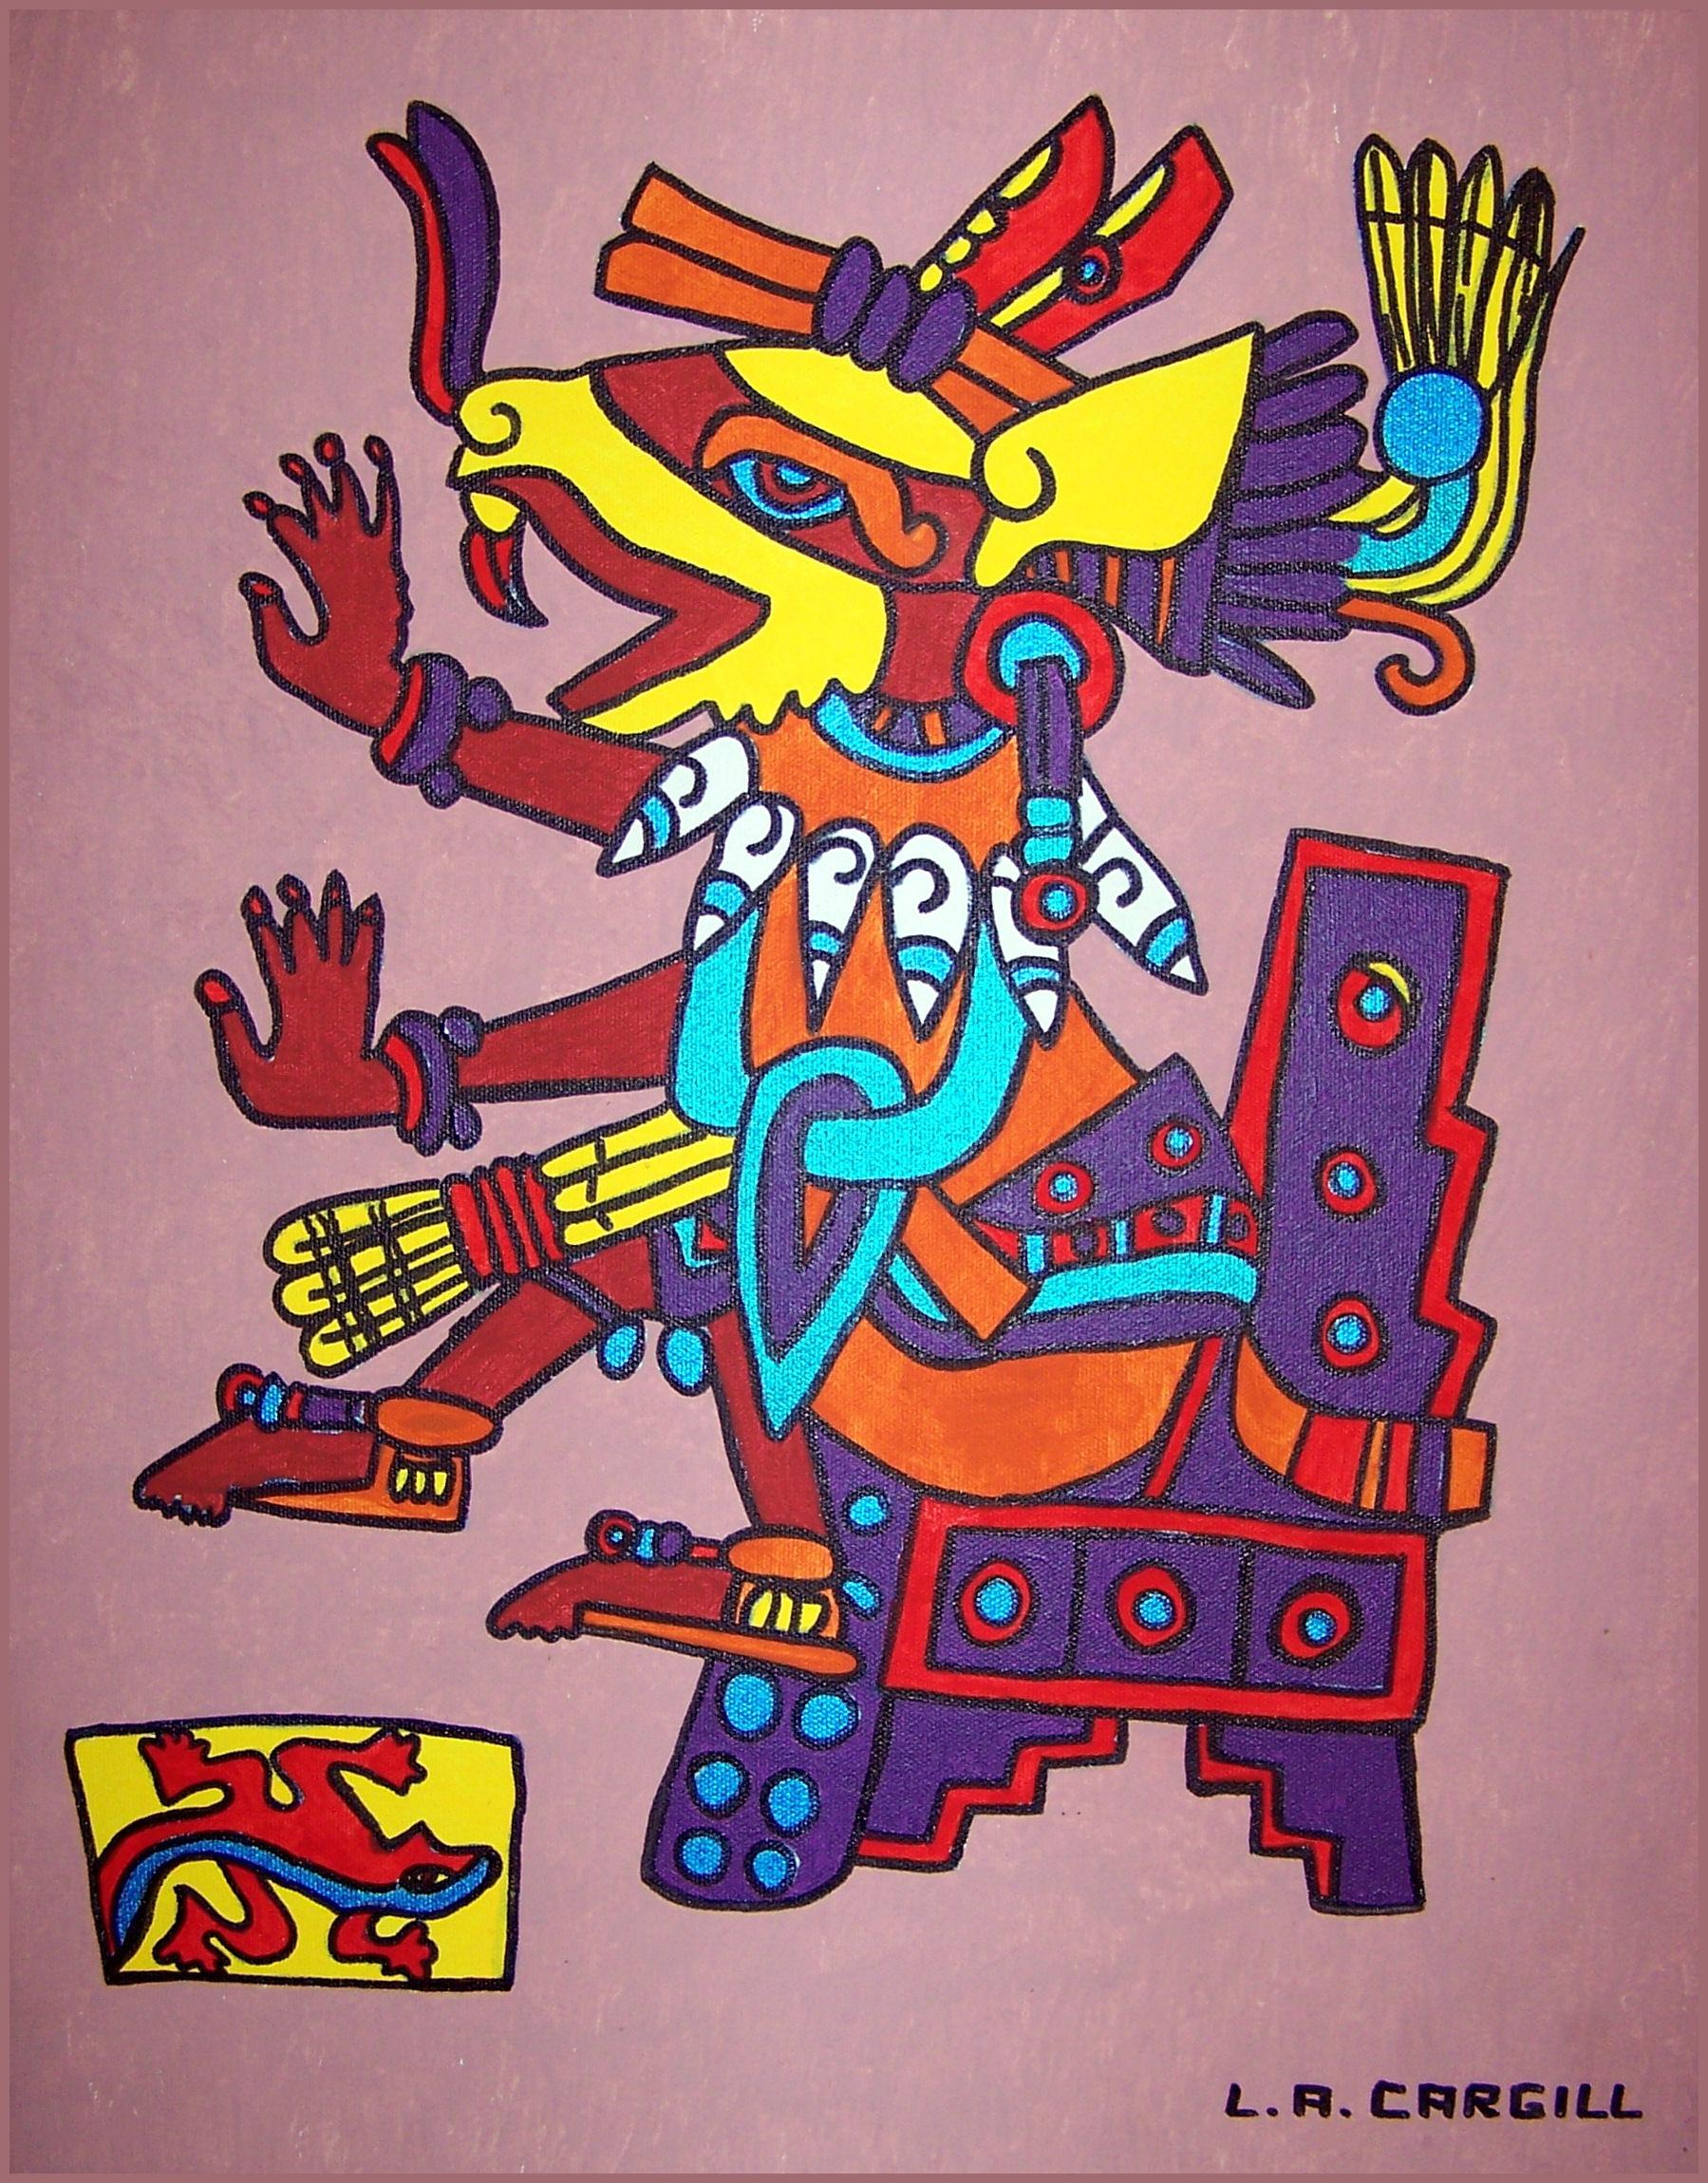 Gambar Burung Aztec Seni Ilustrasi Budaya Angka Angka Allah